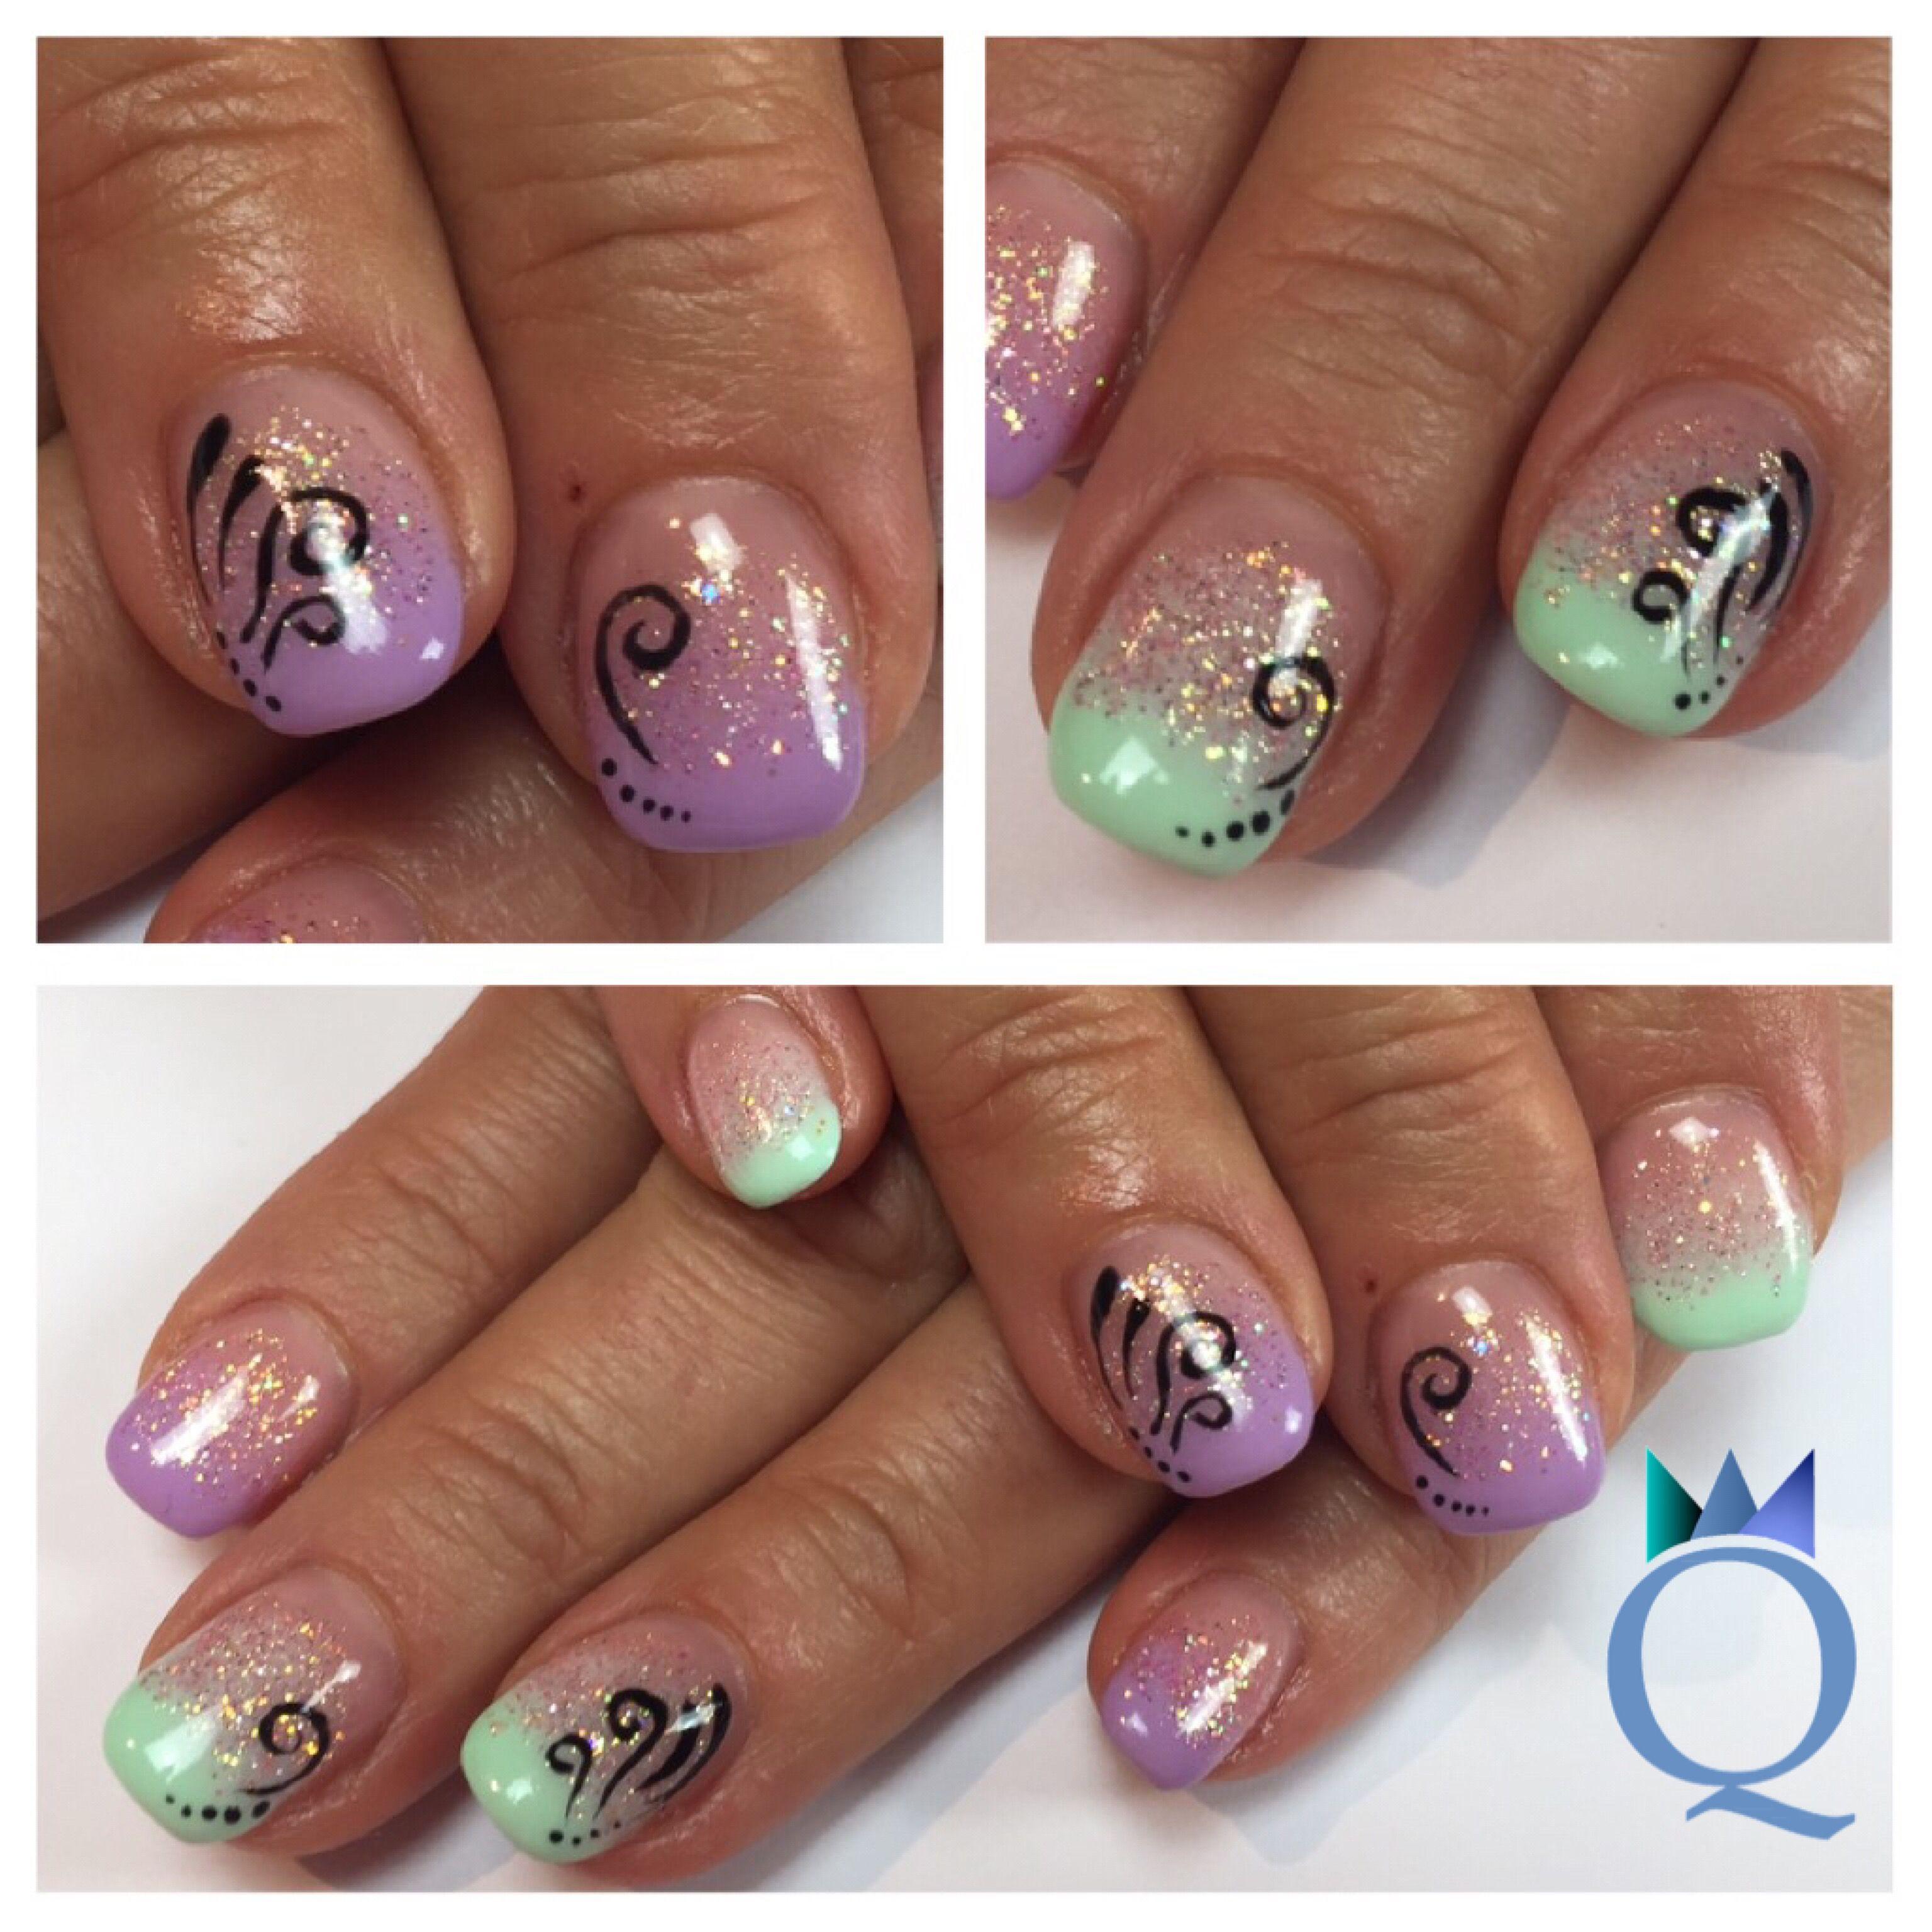 shortnails #gelnails #nails #mint #lilac #ombre #glitter ...